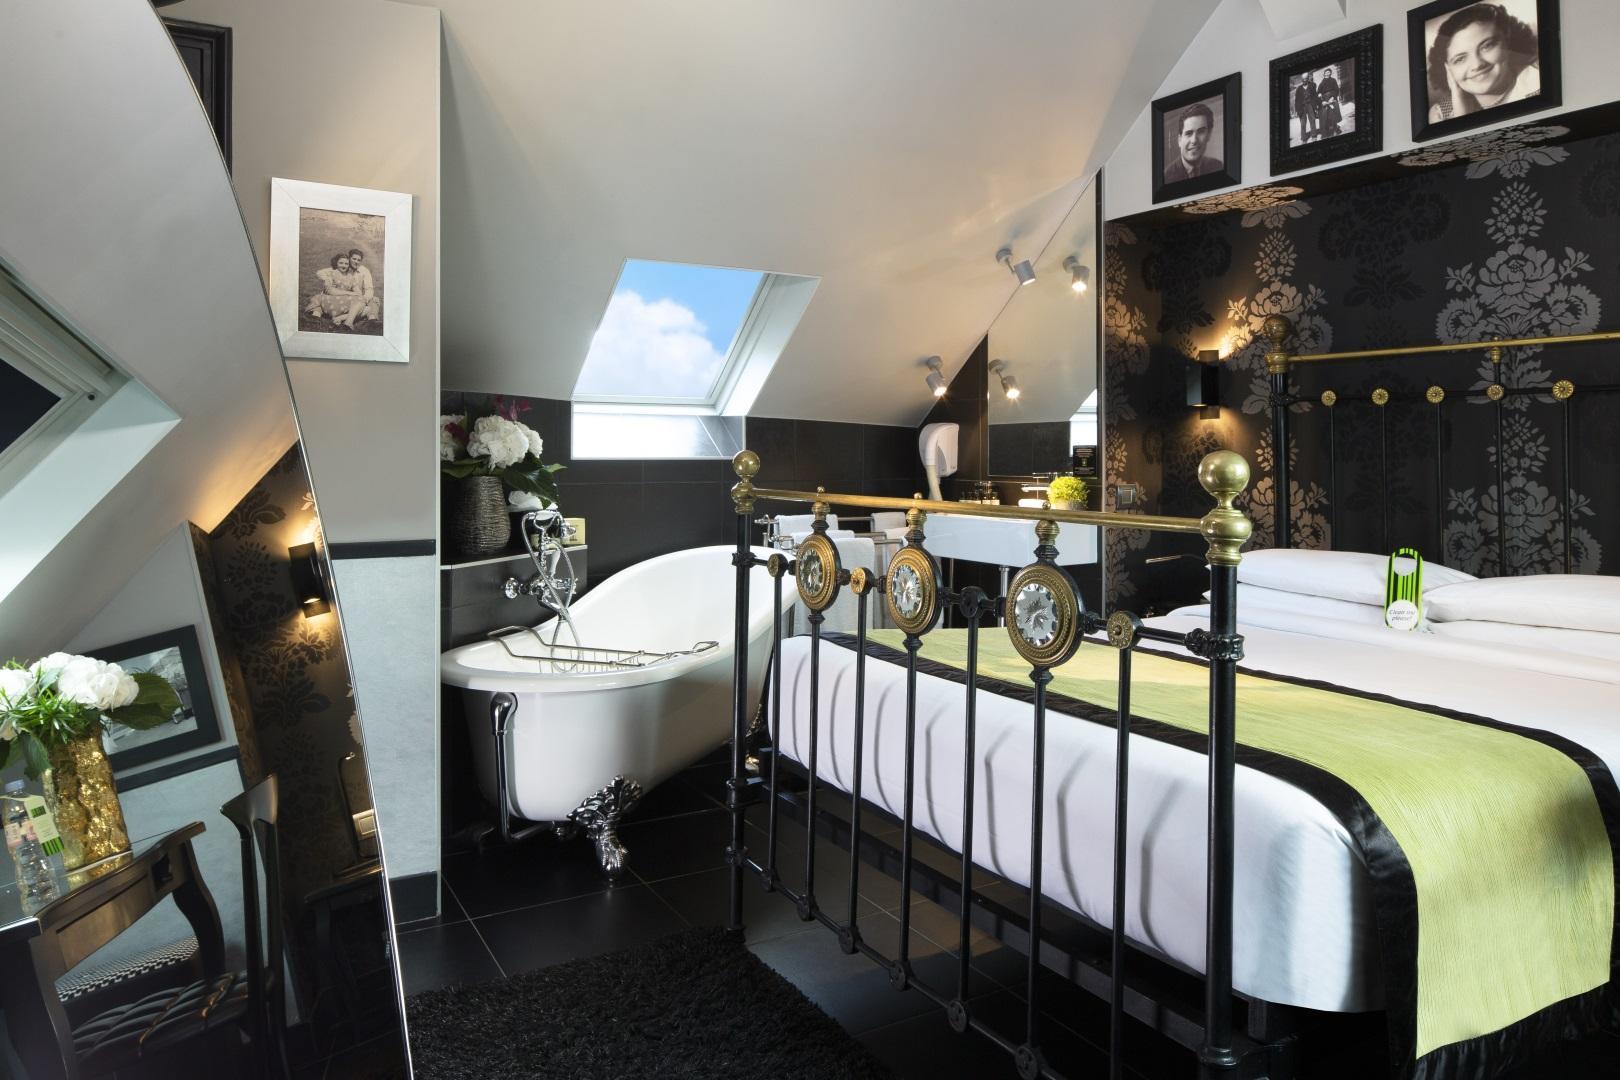 Best Price on Hotel Design Sorbonne in Paris + Reviews